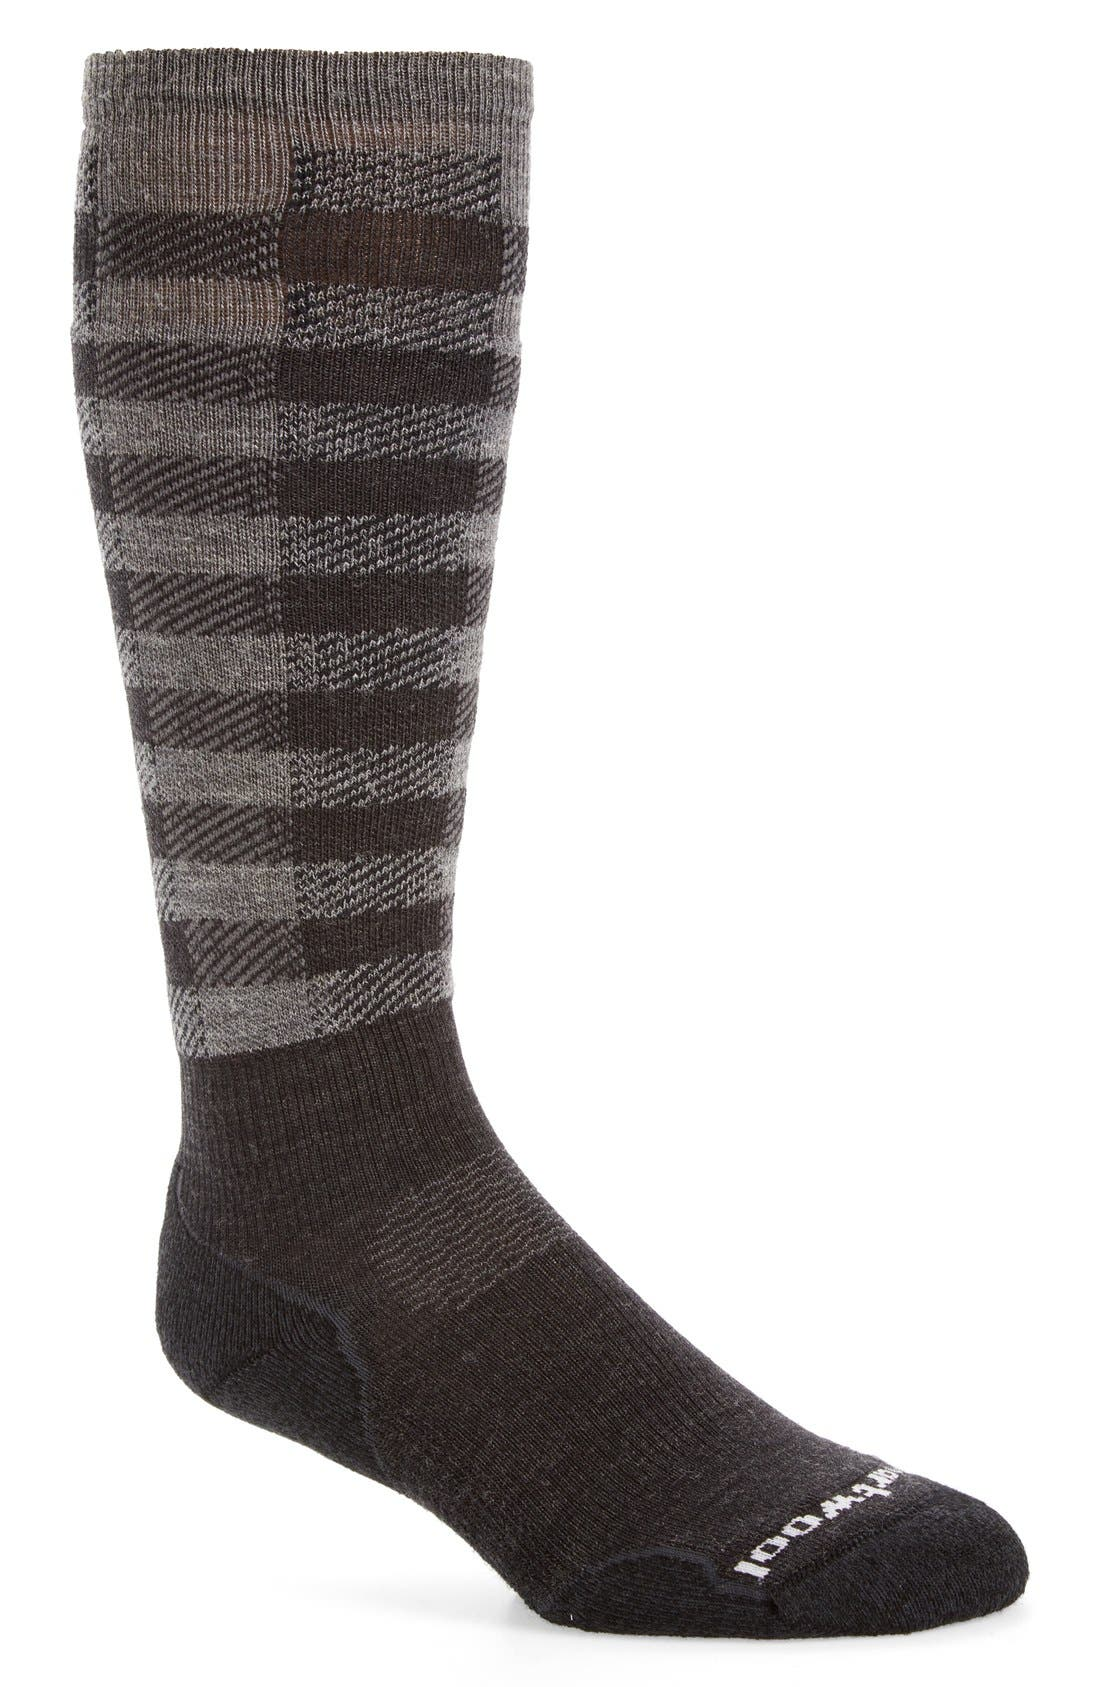 Alternate Image 1 Selected - Smartwool PhD® Slopestyle Light Ifrane Over the Calf Socks